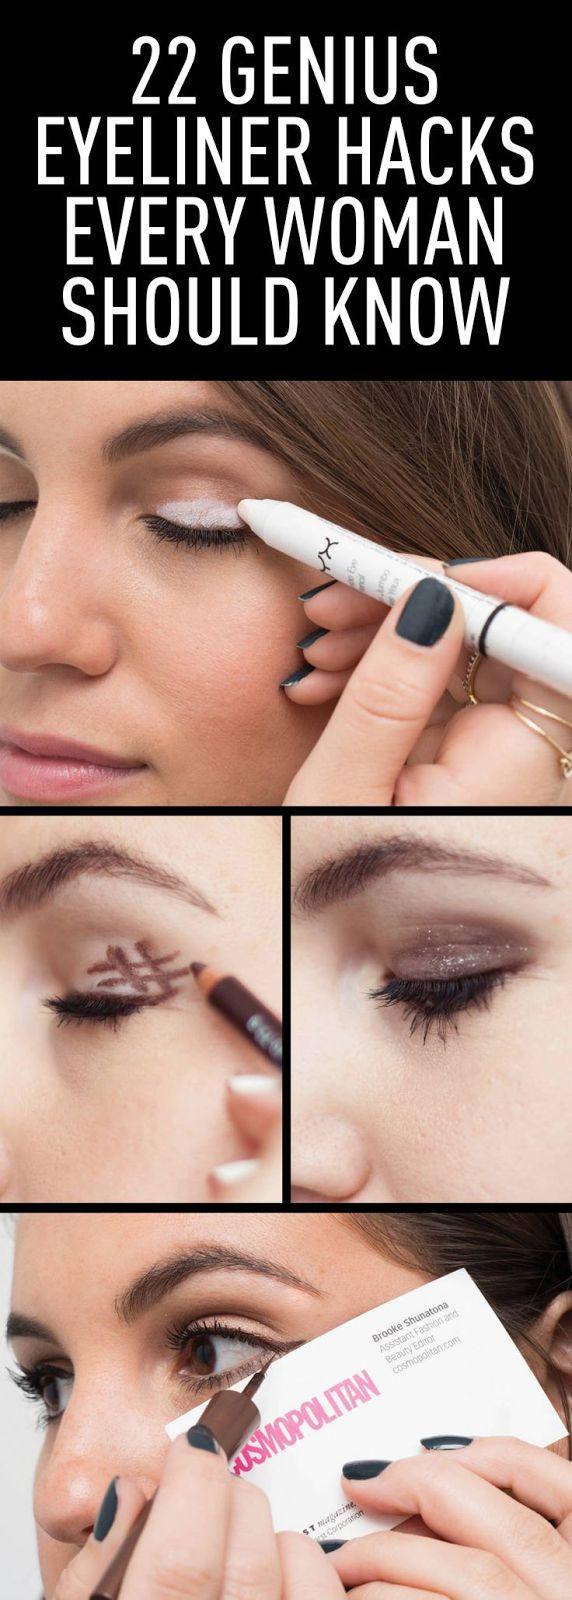 △▽△ 22 Genius Eyeliner Hacks Every Woman Needs to Knowy